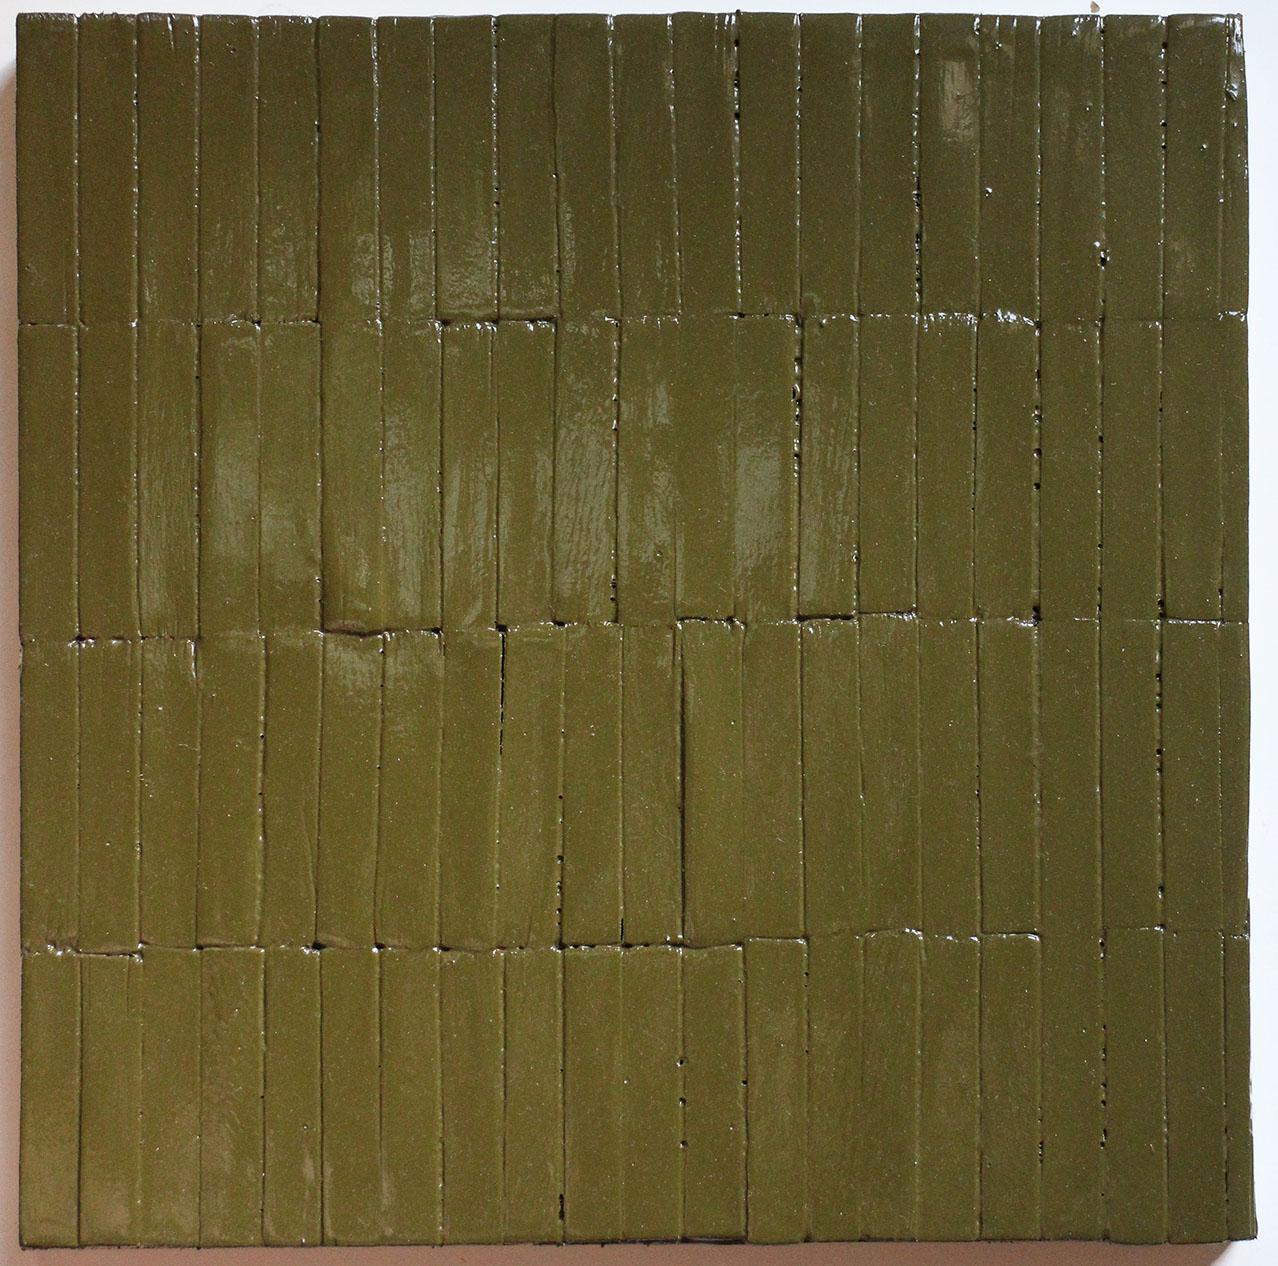 Khaki Painting 1 9.2.14